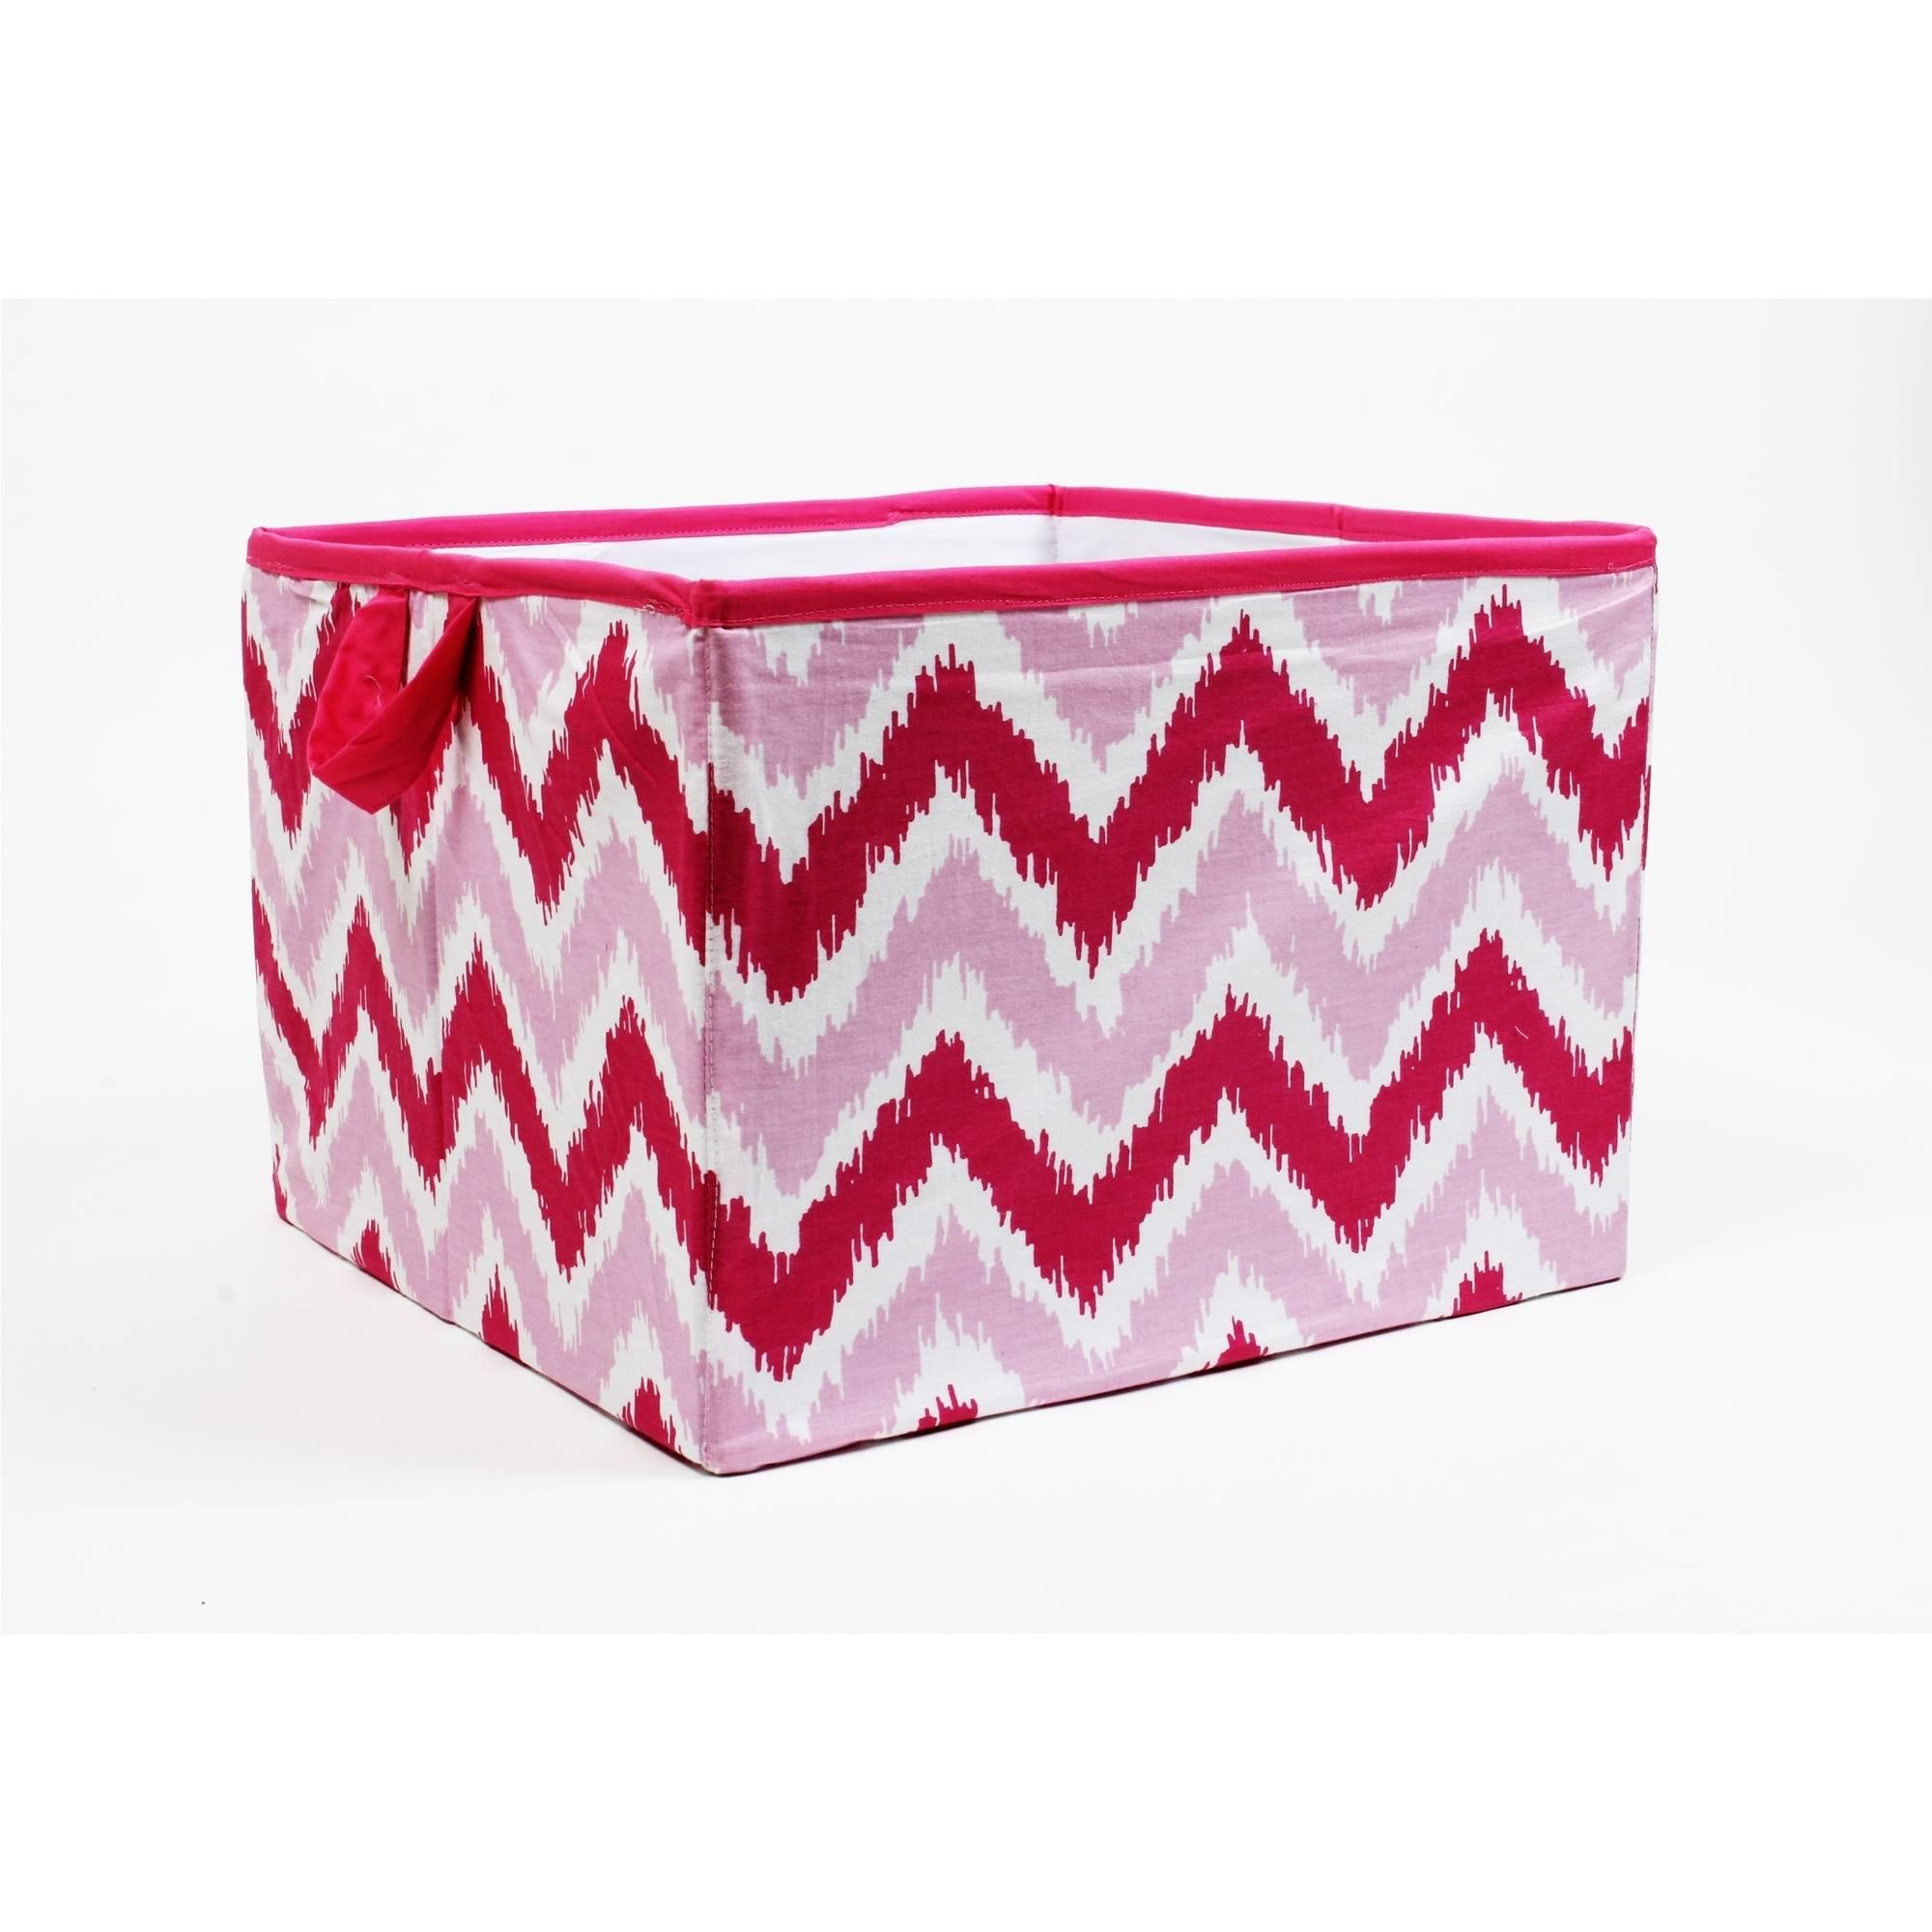 Urban Shop Colorblock Round Storage Basket (3 colors) $10, Urban Shop Sequin Storage Trunk $15 & More + Free ship w/ $35